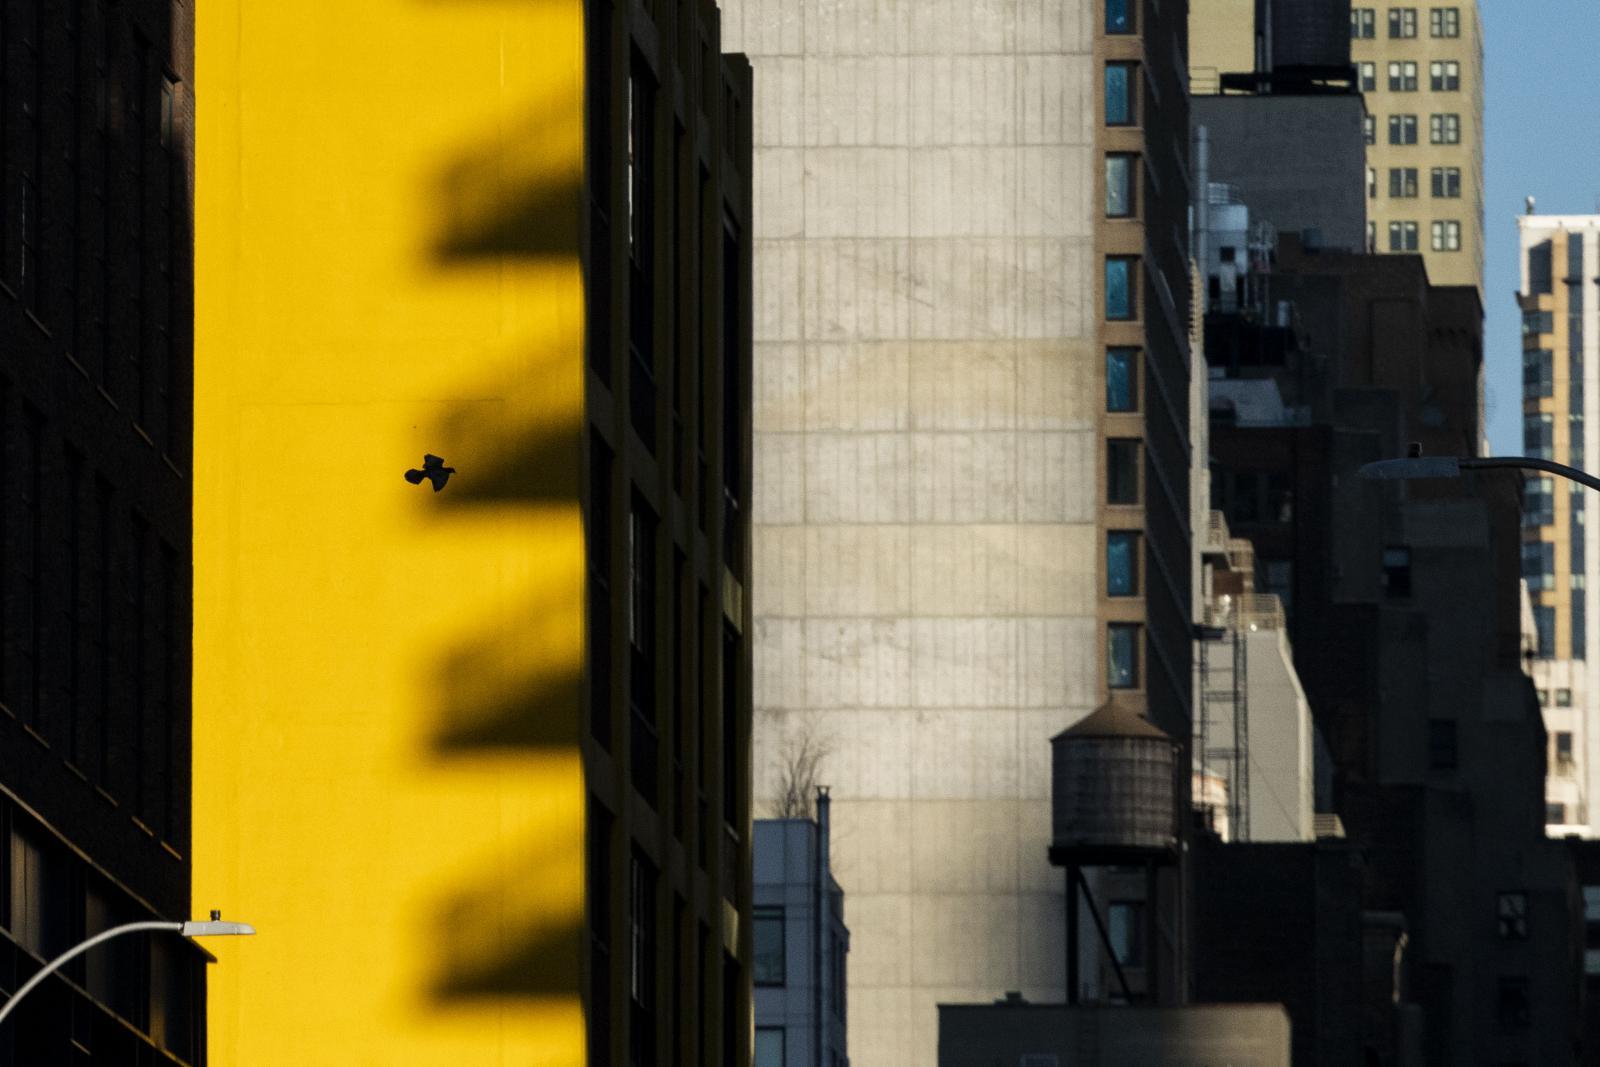 Photography image - Loading Lefevre_COVID19_03.JPG